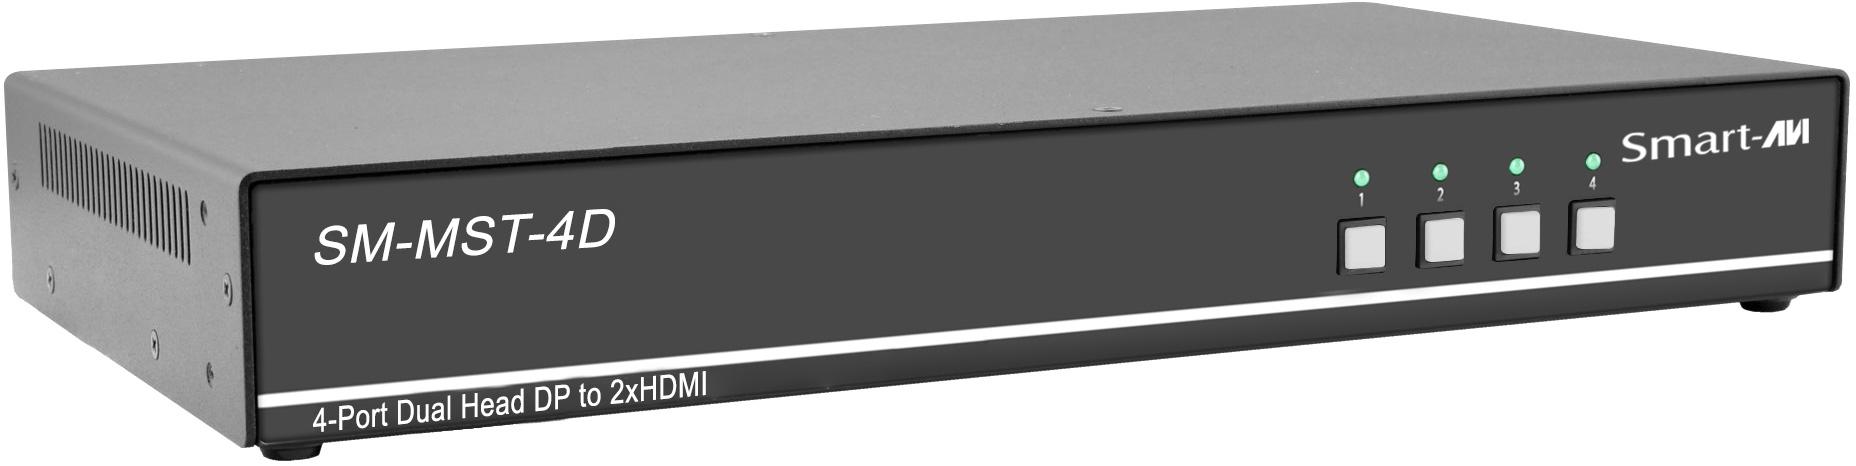 Smart AVI SM-MST-4D MultiStream Transport Technology KVM Switch with Dual 4K HDMI Out - 4 Port SAVI-SM-MST-4D